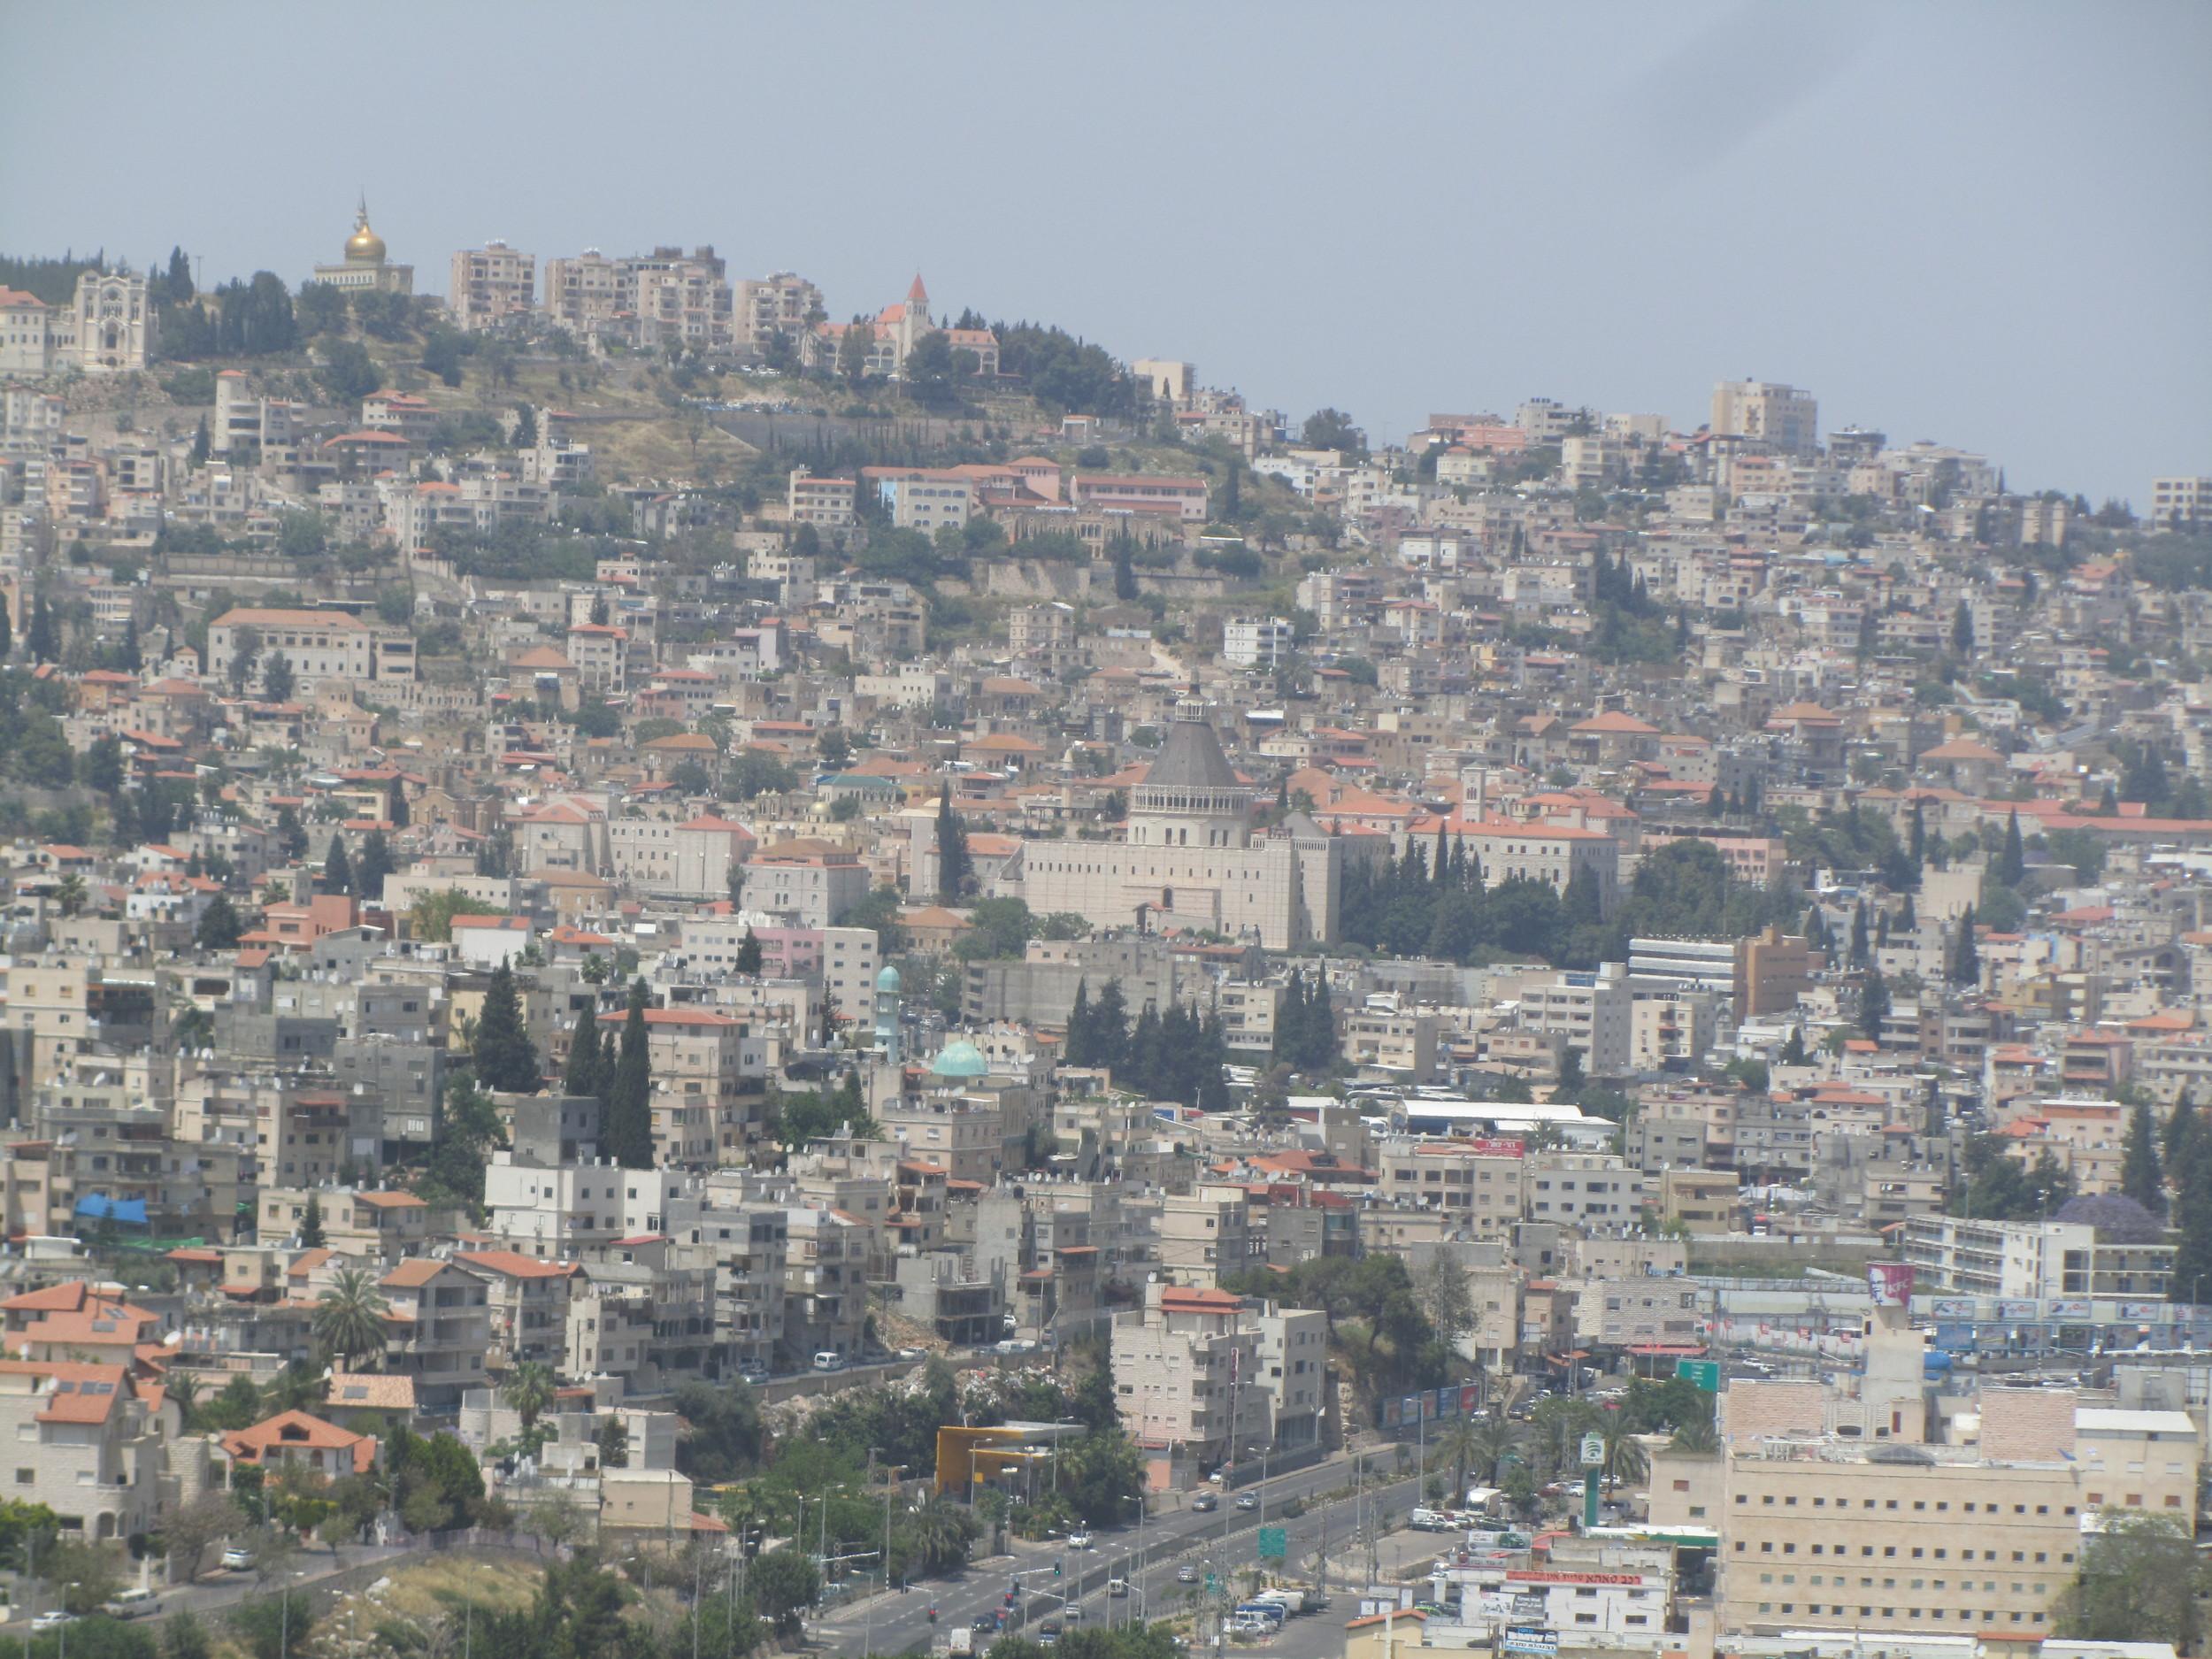 The Modern City of Nazareth